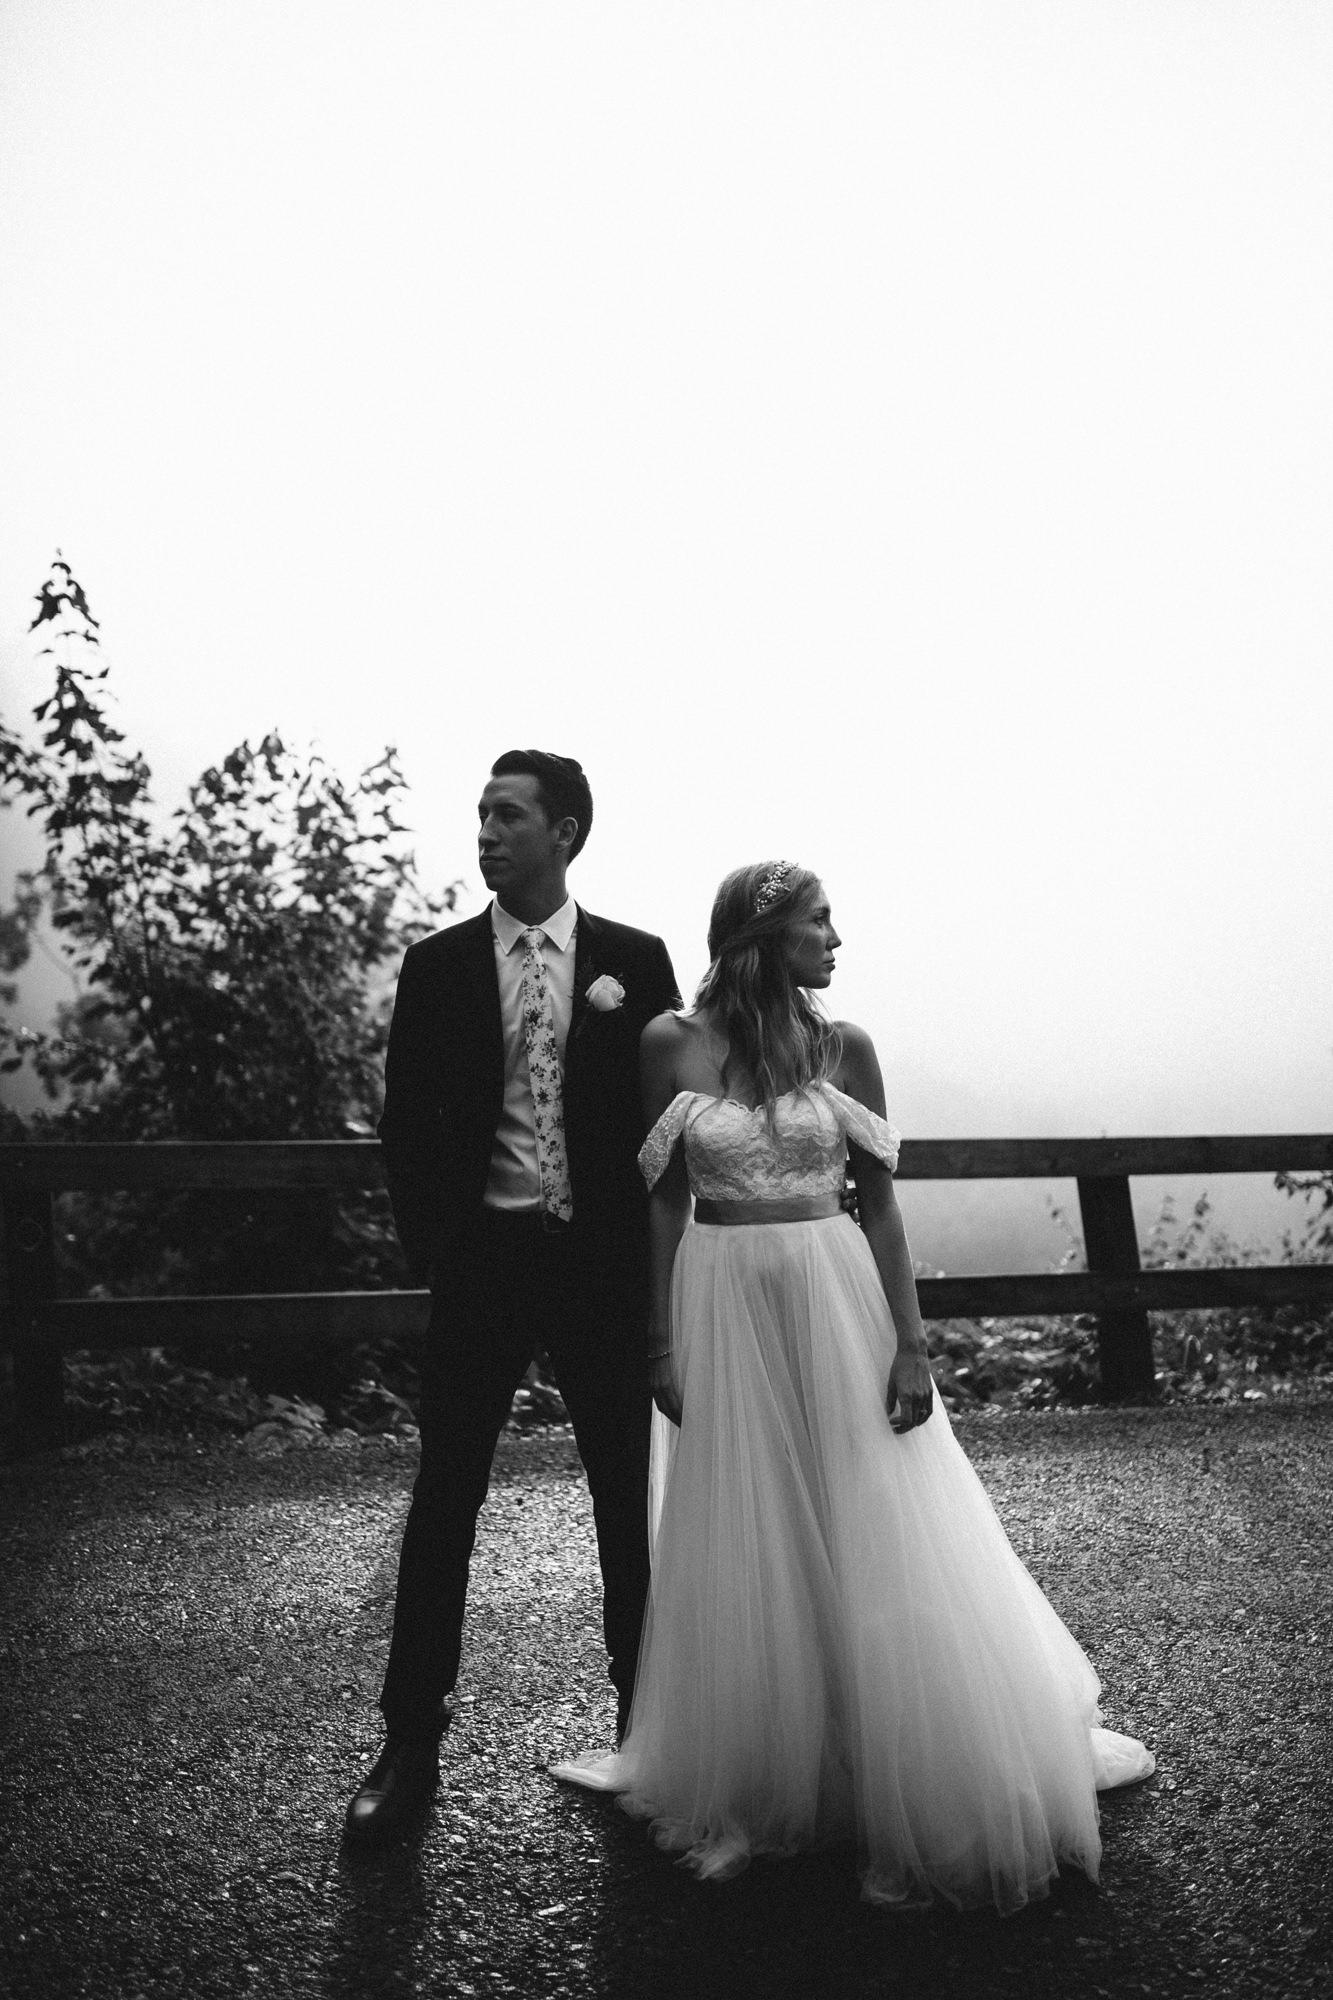 nashville_tennessee_wedding_photographer-121.jpg